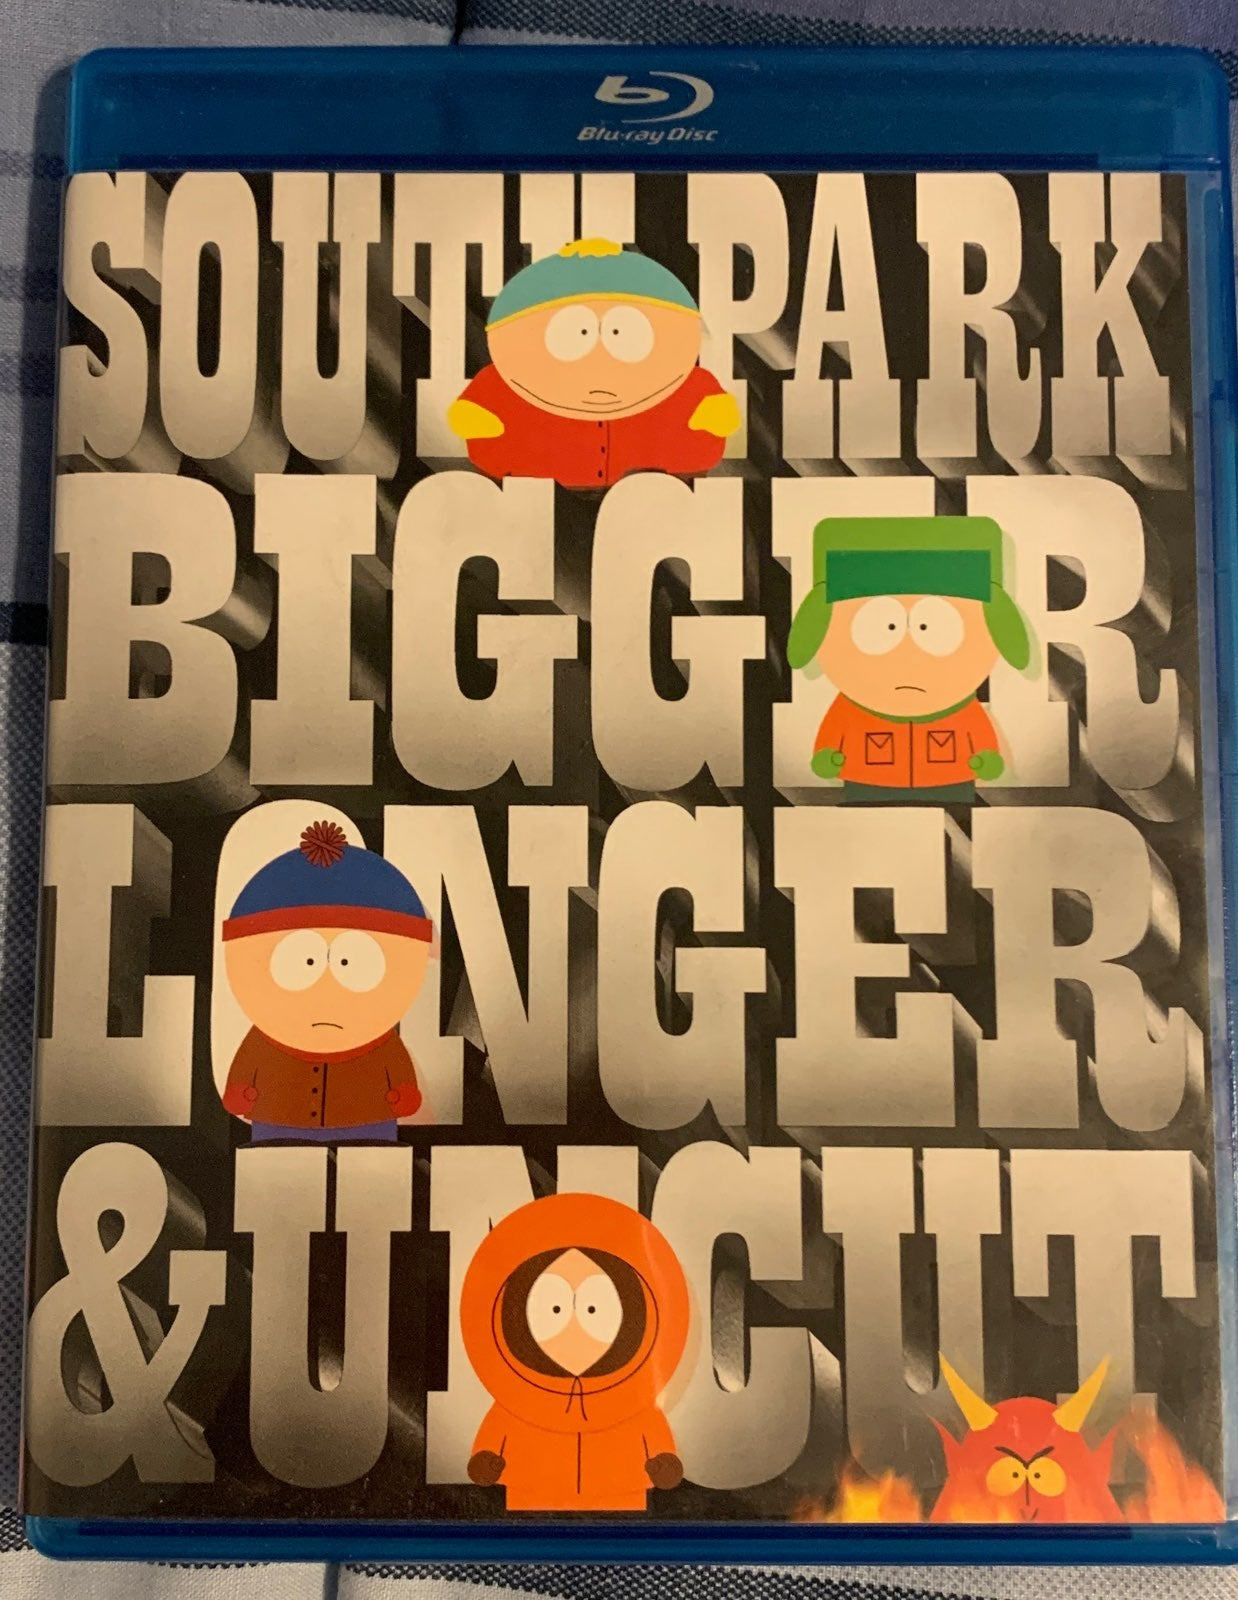 South Park Bigger, Longer & Uncut on Blu